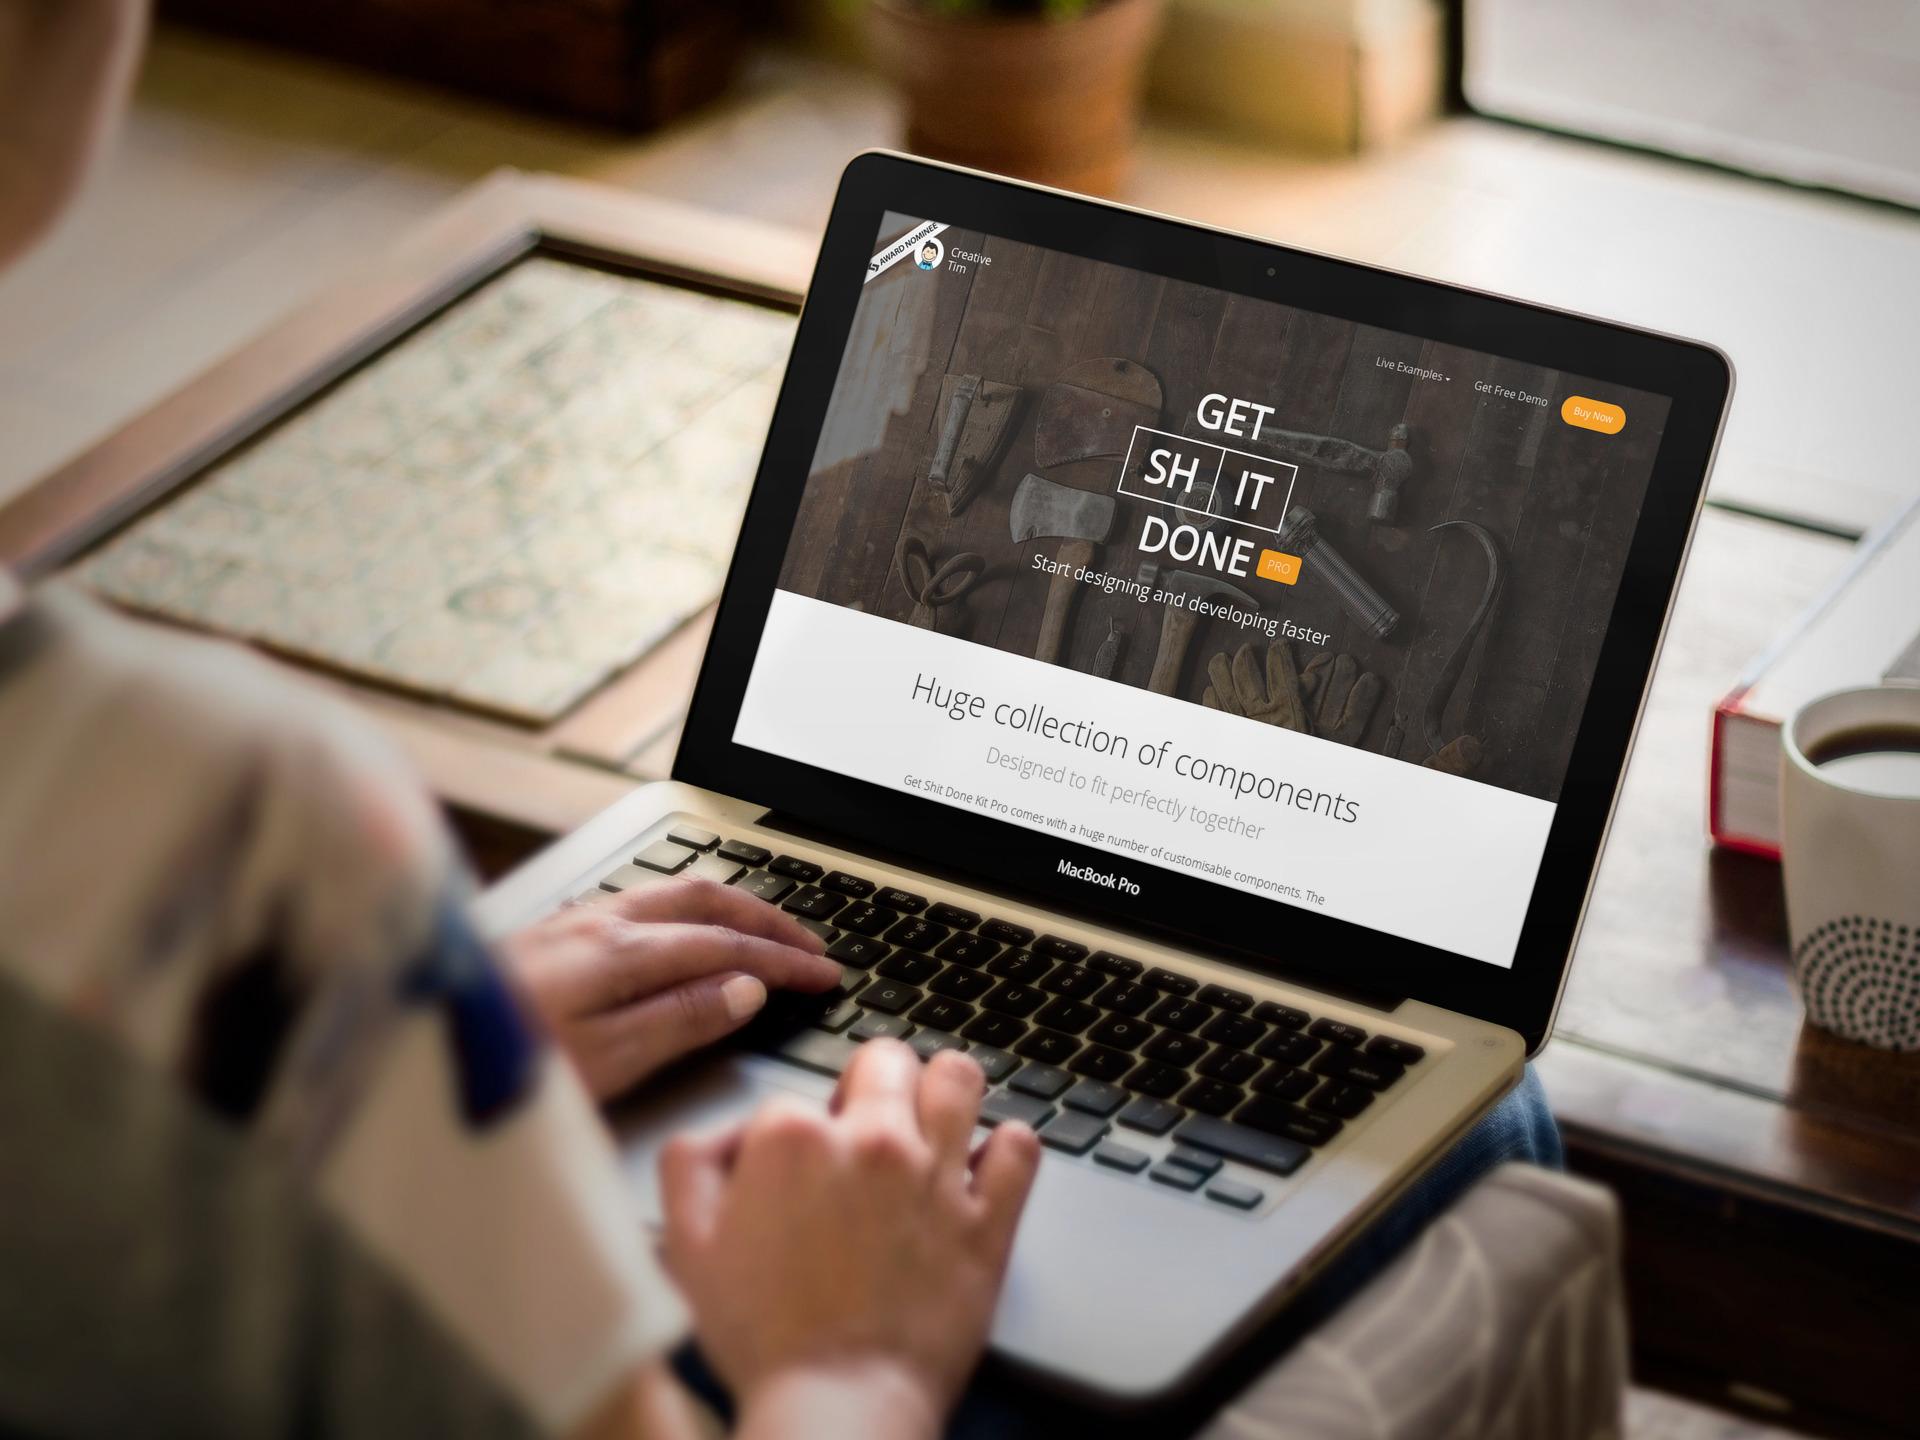 macbook mockups to promote your website or web app